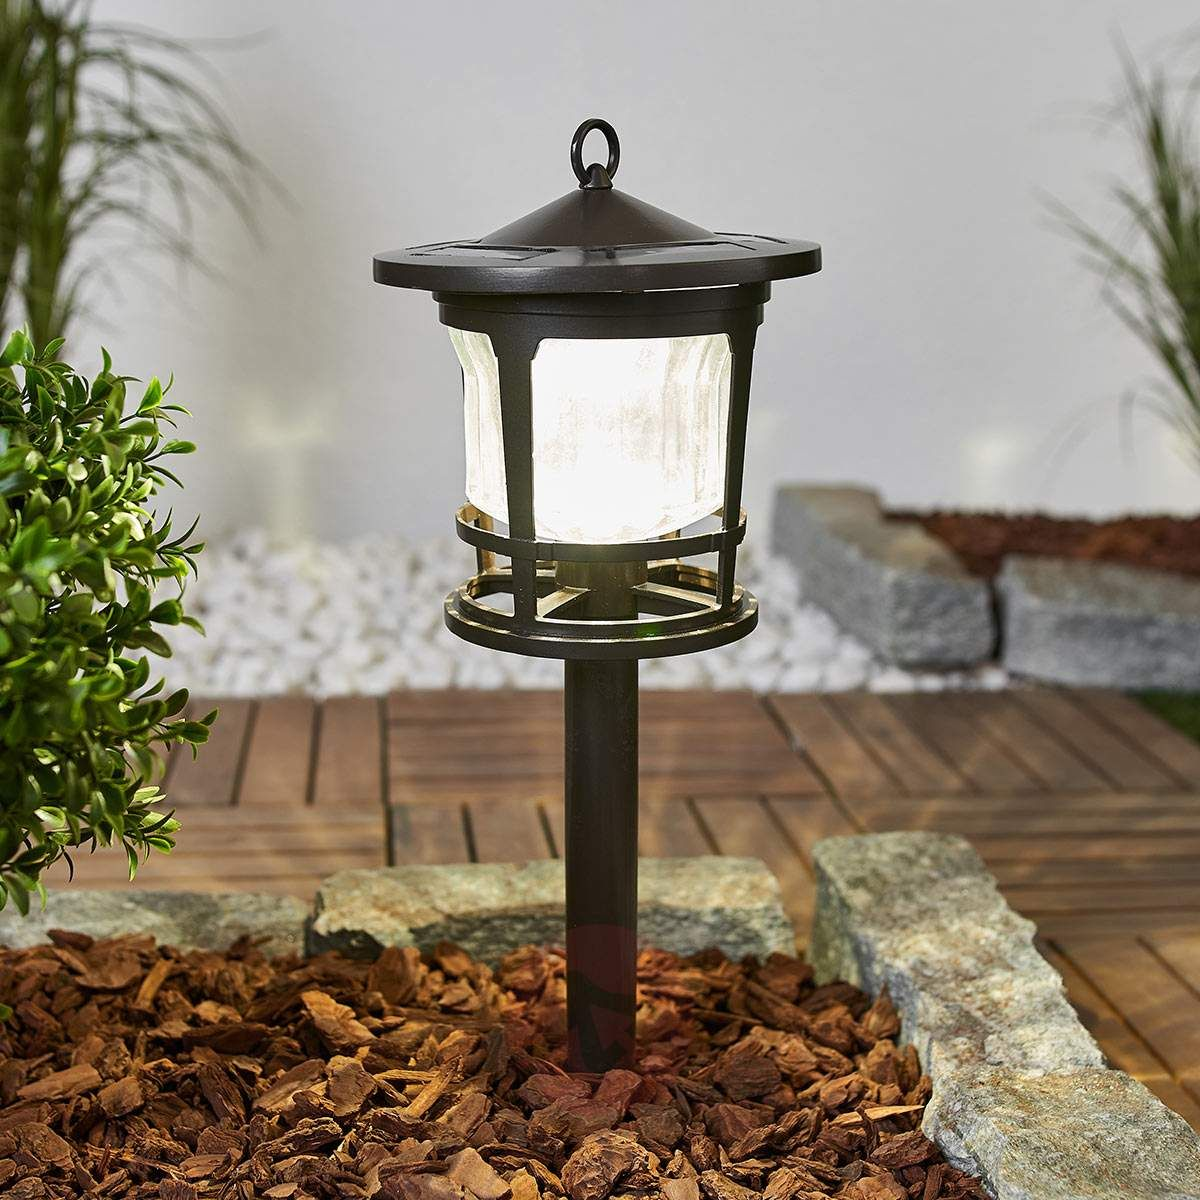 Piękna Lampa Solarna Led Hagen Ze Szklanym Kloszem Lampy